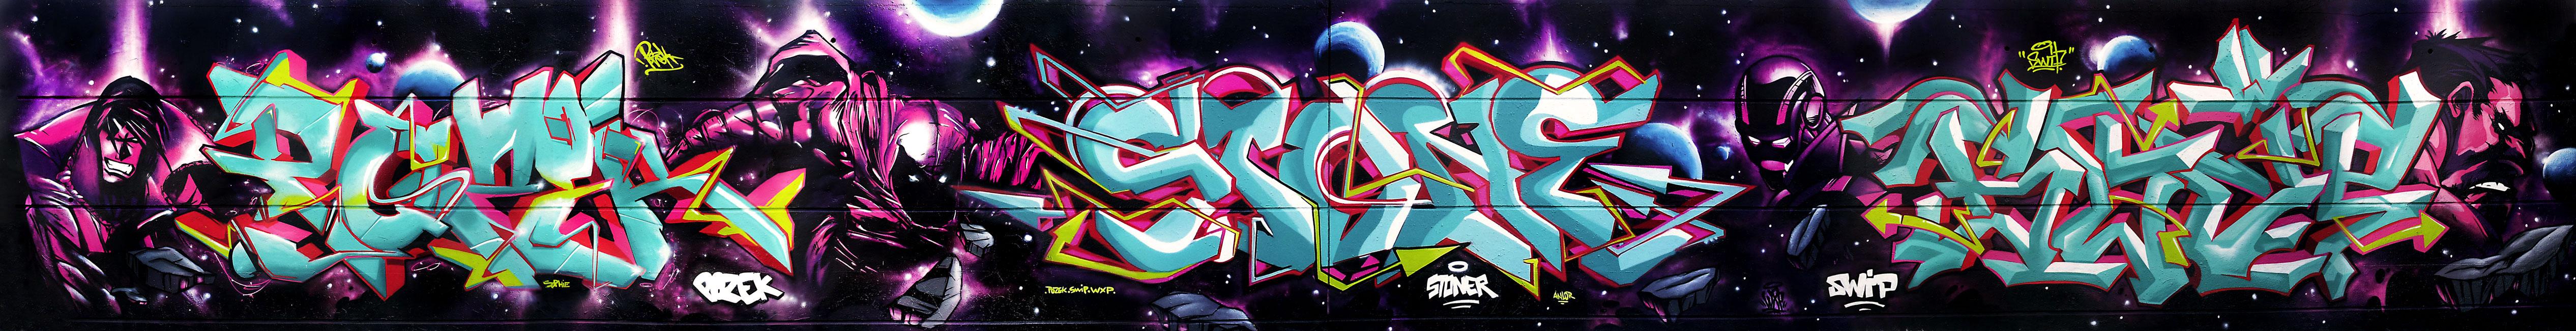 pozek-stoner-swip-hd2